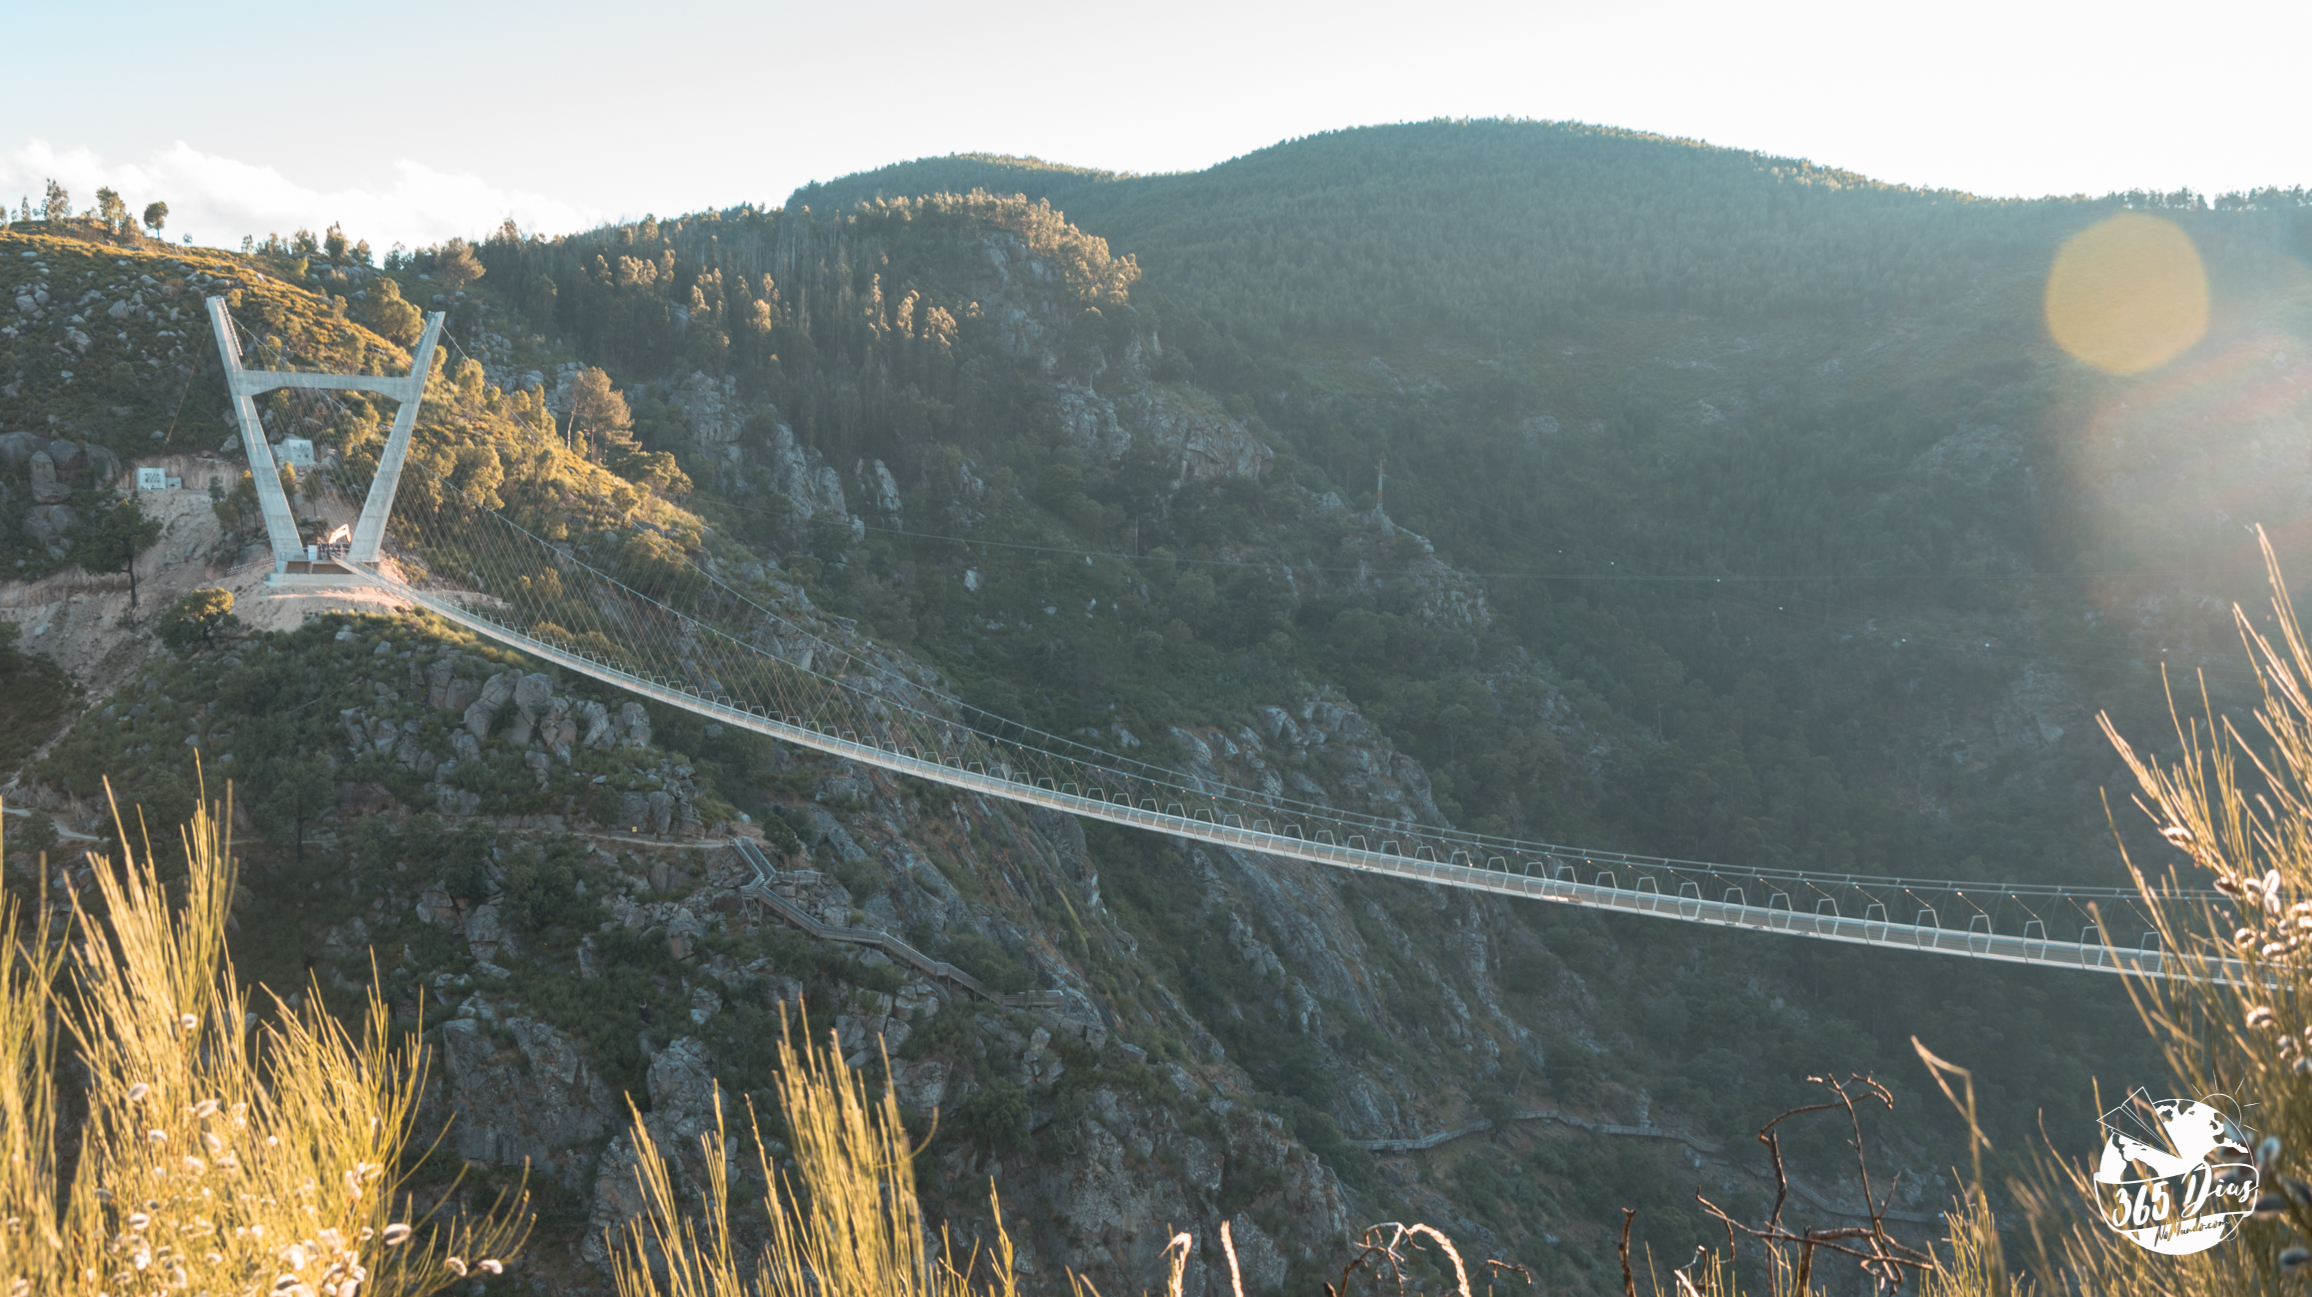 ponte suspensa de Arouca